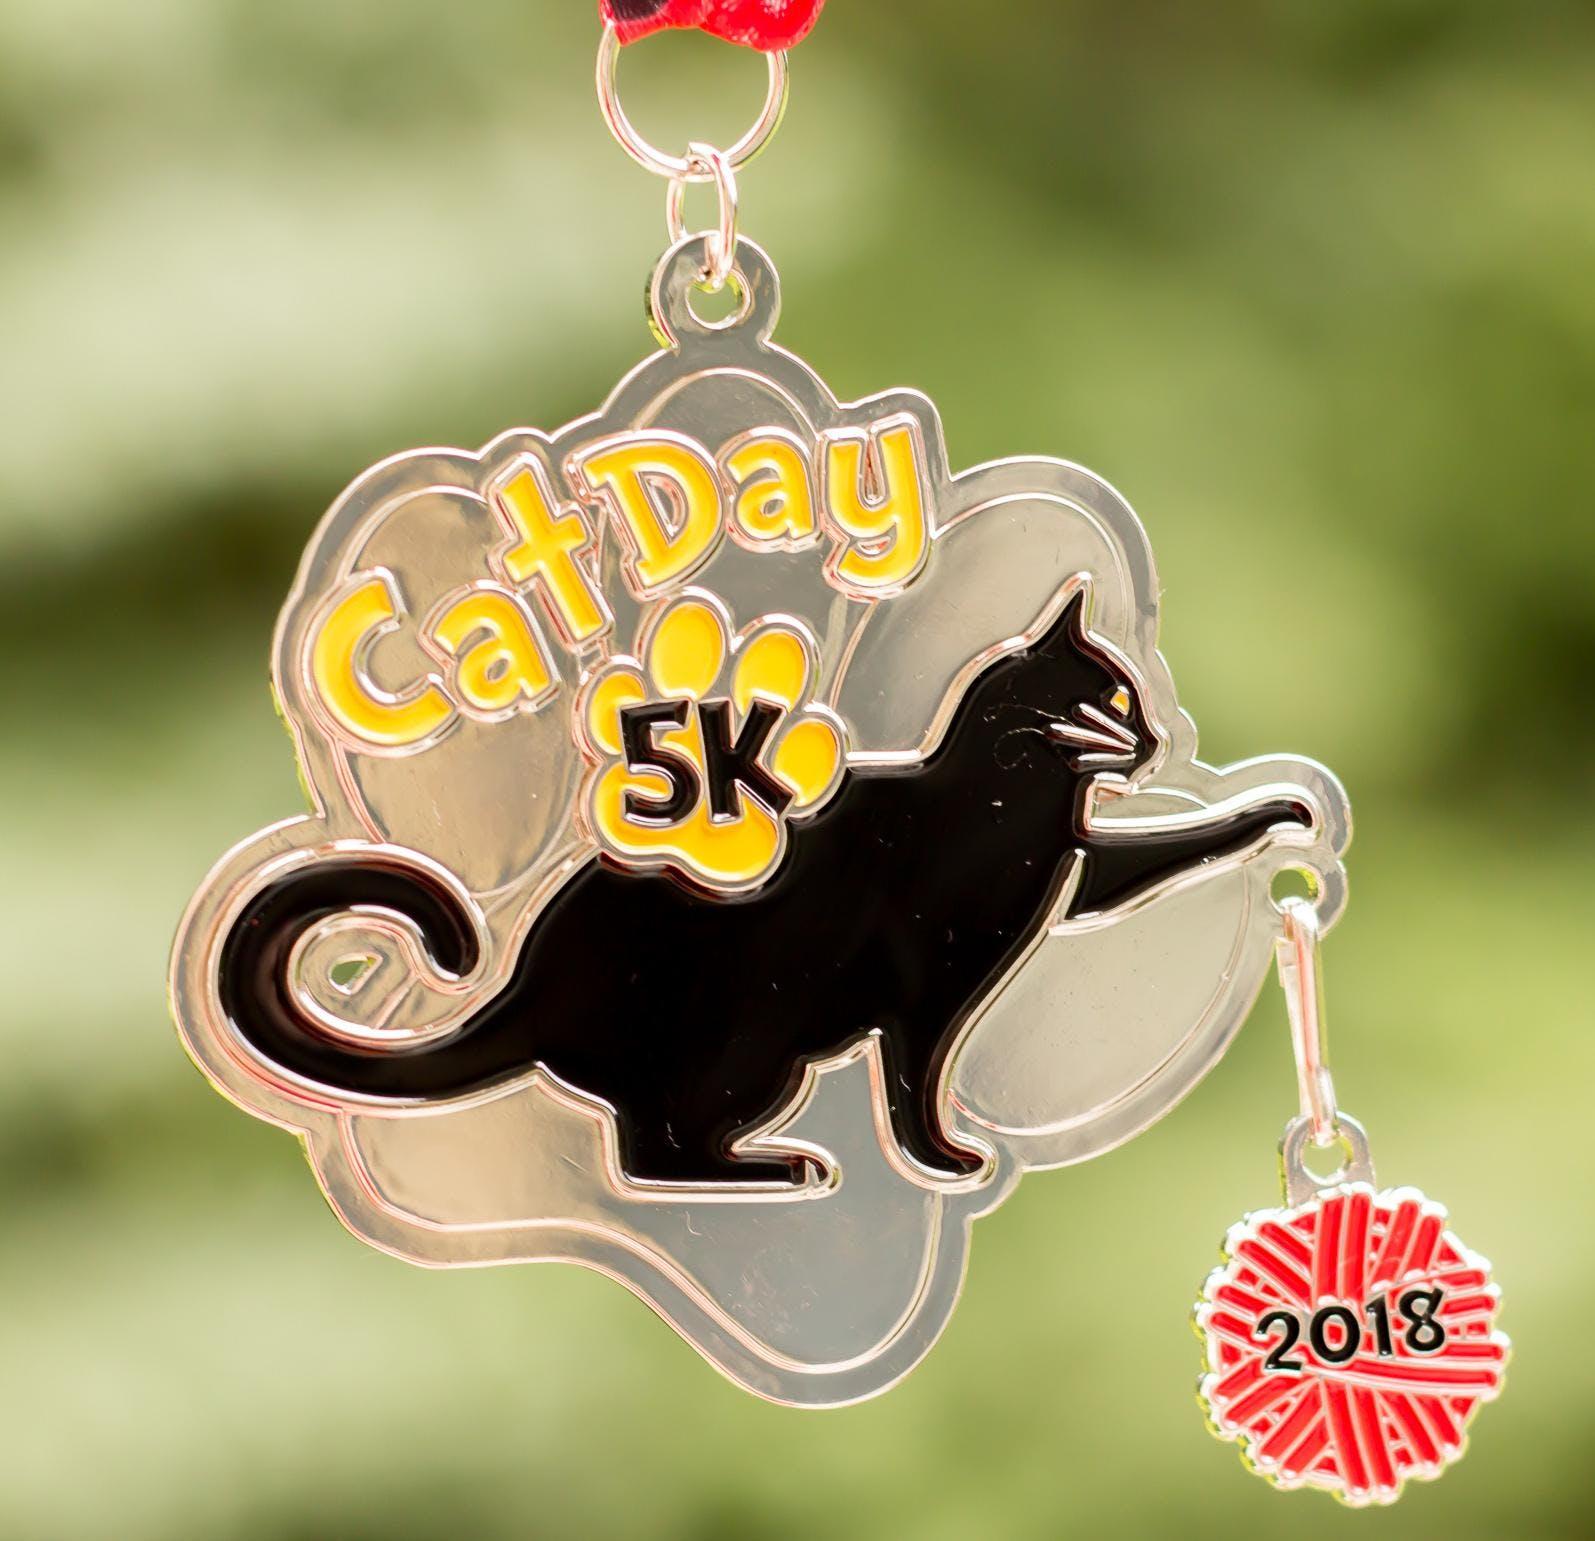 Now Only $10 Cat Day 5K & 10K -Lexington